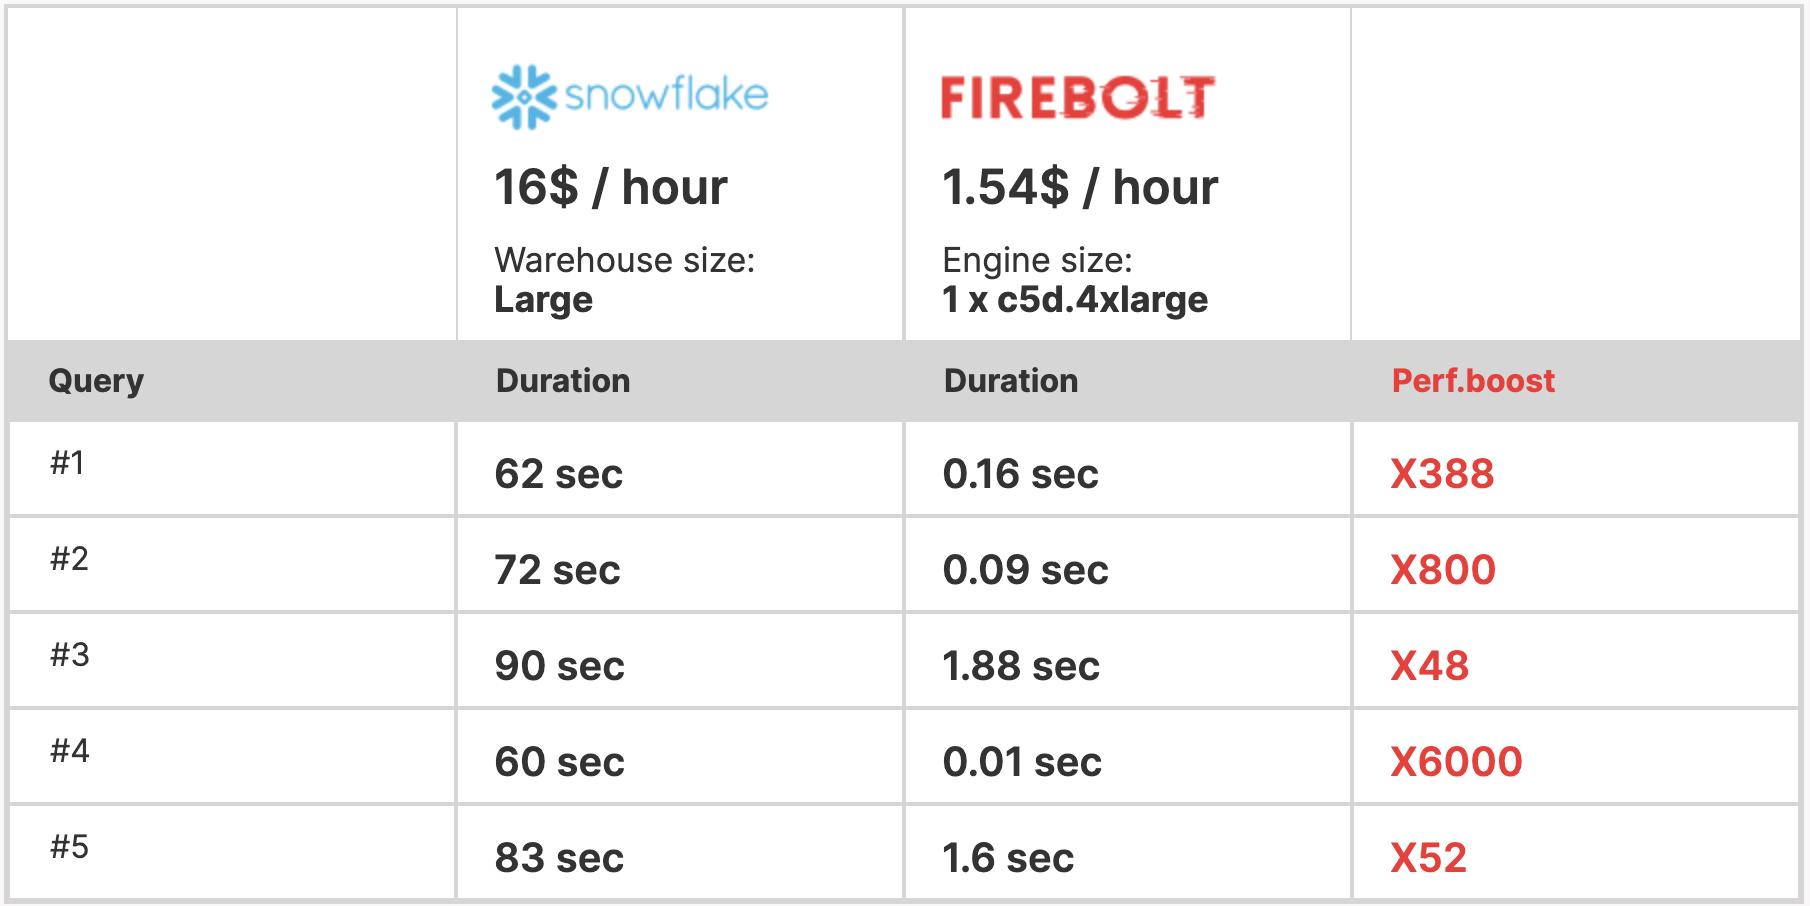 Customer benchmark comparing Snowflake to Firebolt